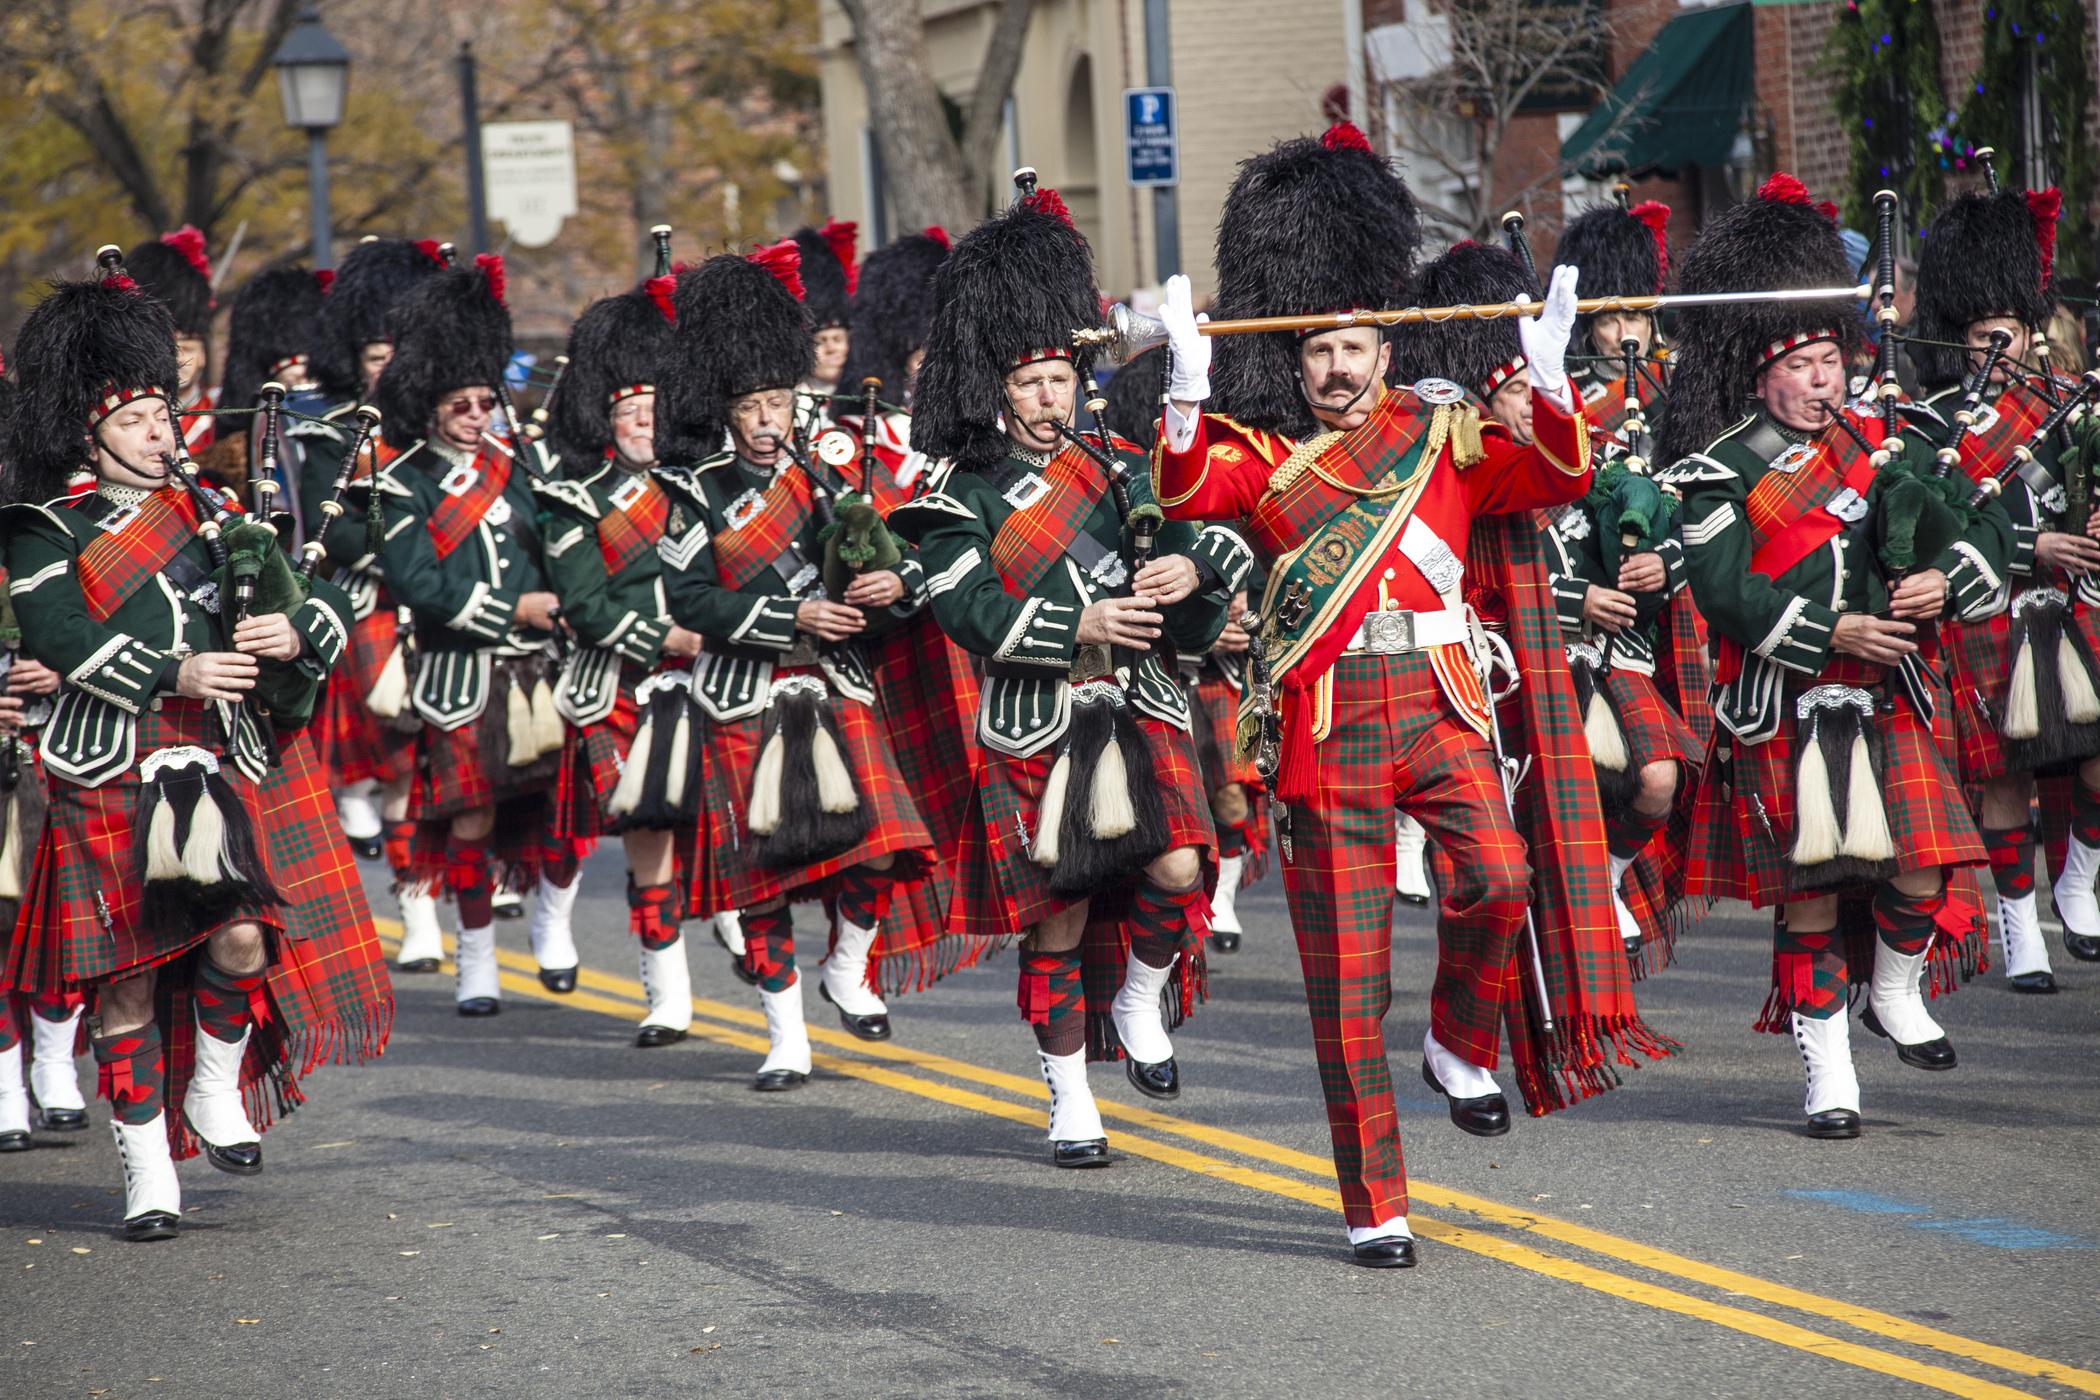 City Of Alexandria Scottish Christmas Wa;Lk 2020 Alexandria's Biggest Holiday Weekend